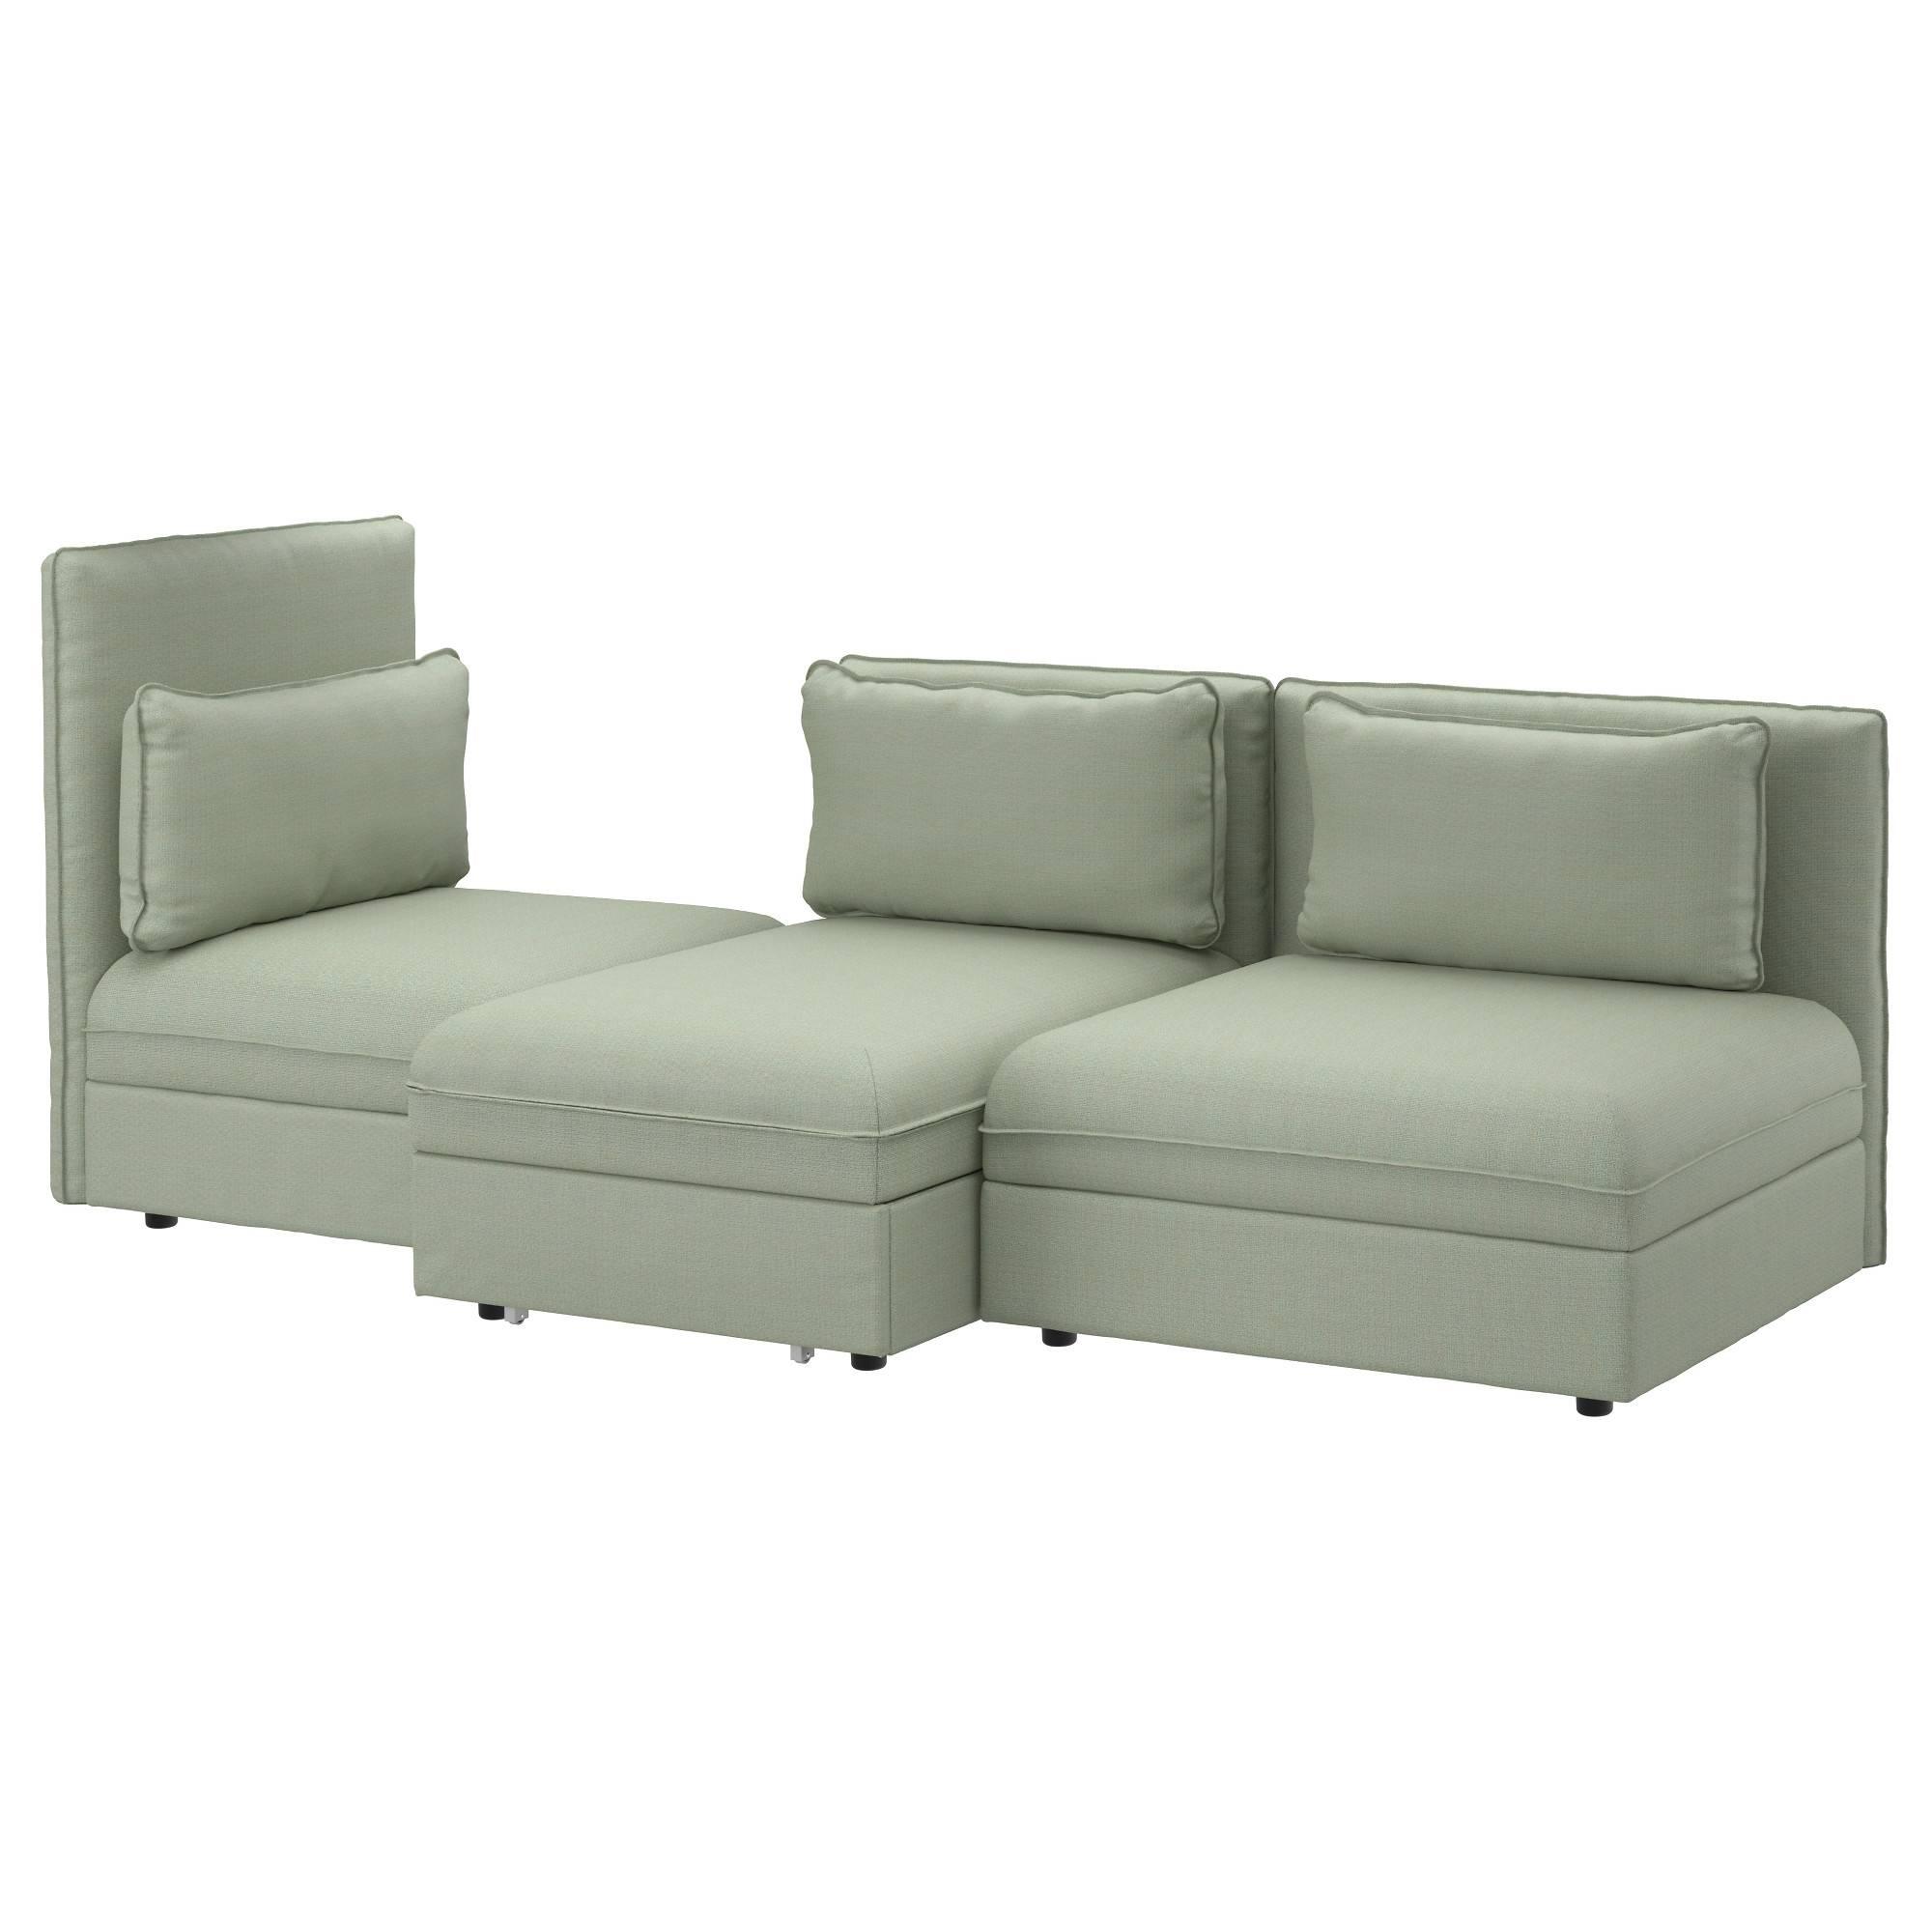 Sofa Beds & Futons - Ikea throughout Sectional Sofa Beds (Image 19 of 30)